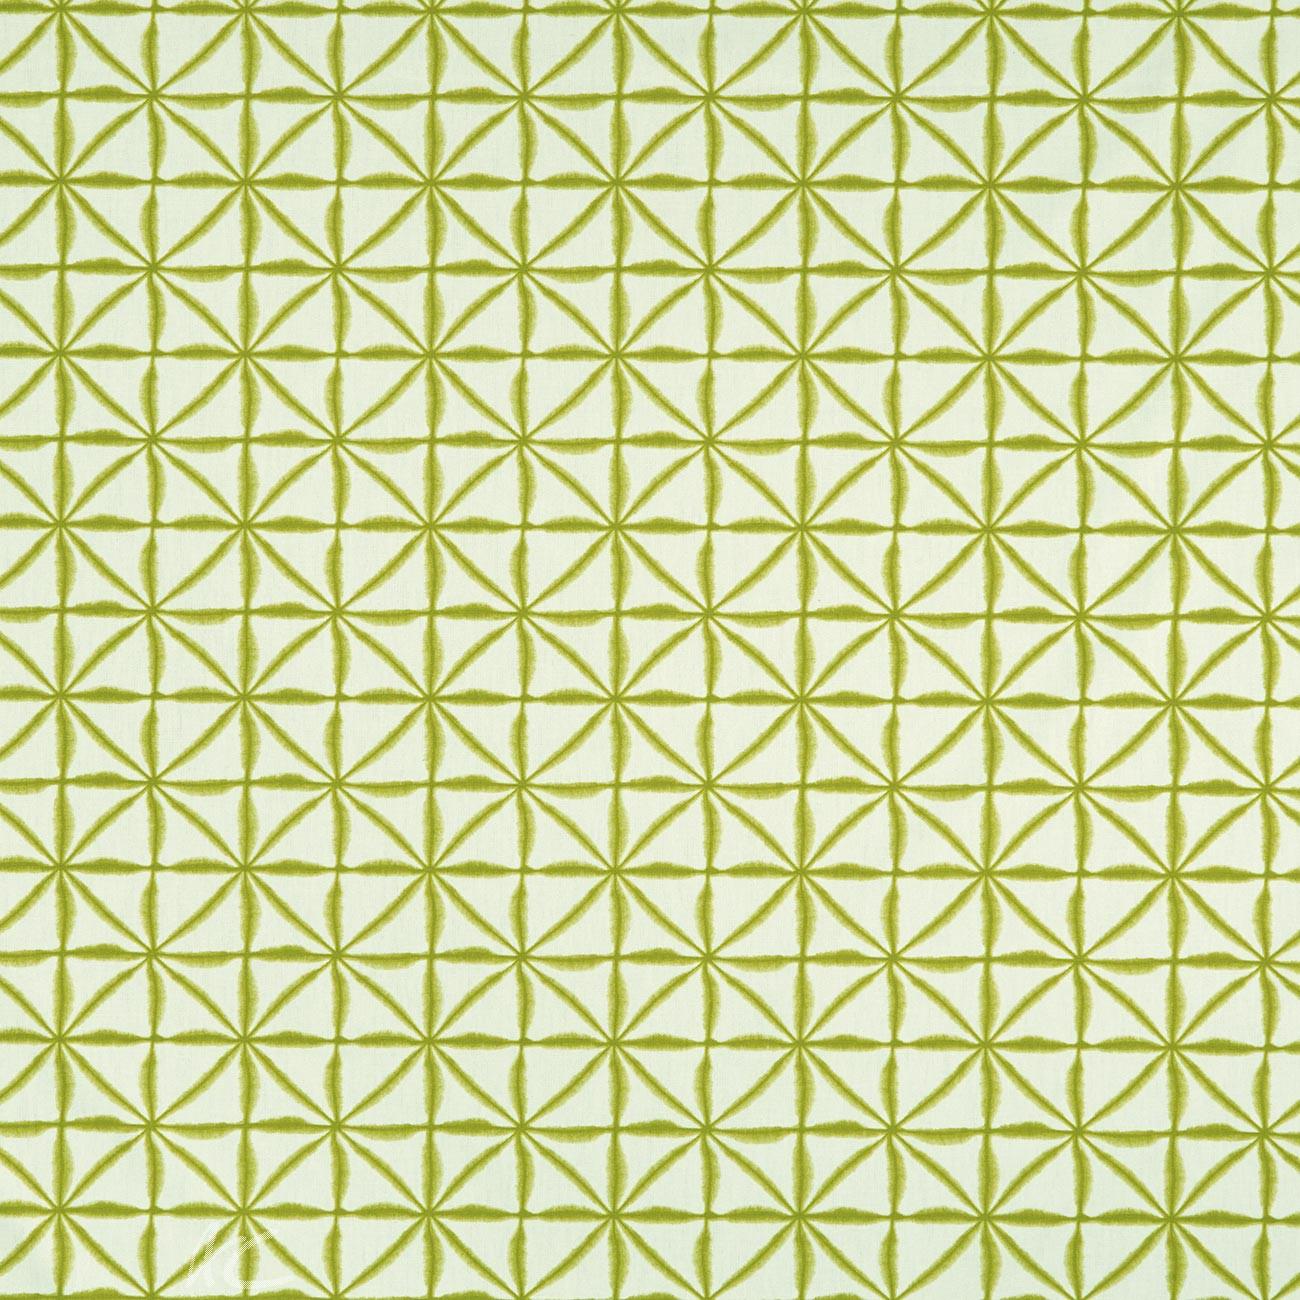 Clarke and Clarke Batik Nusa Citrus Cushion Covers